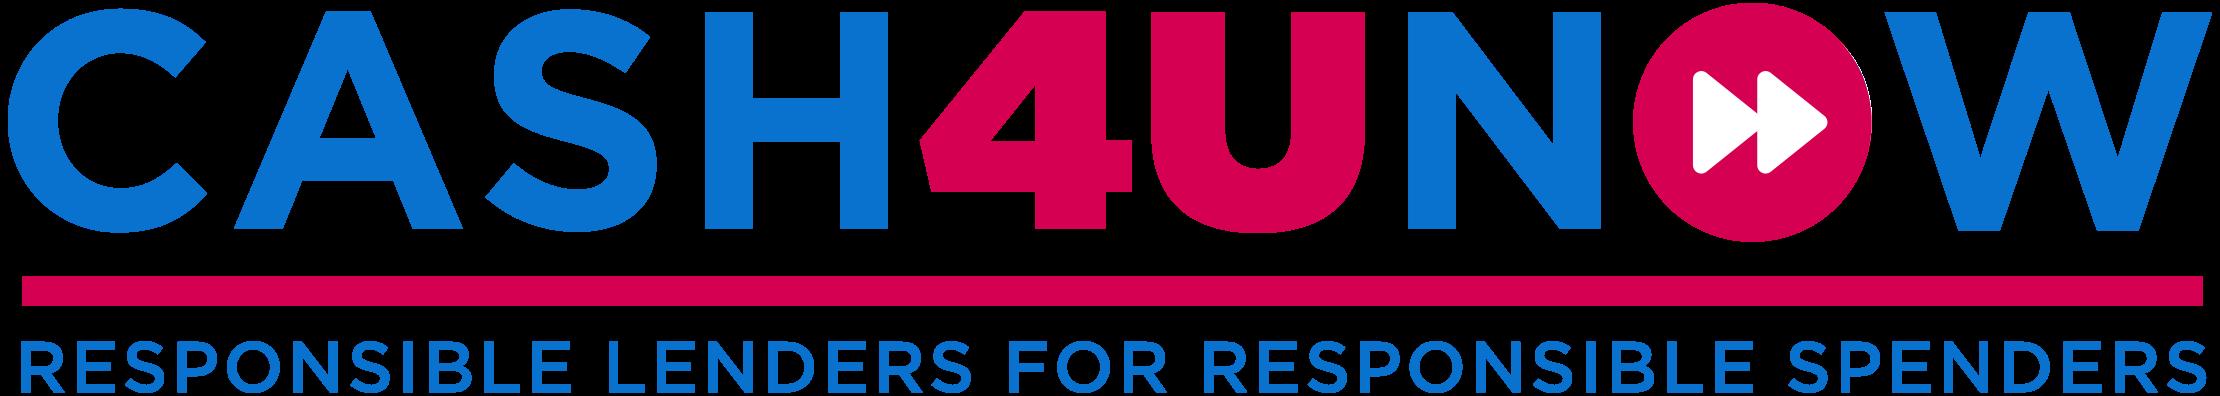 Cash4unow-logo